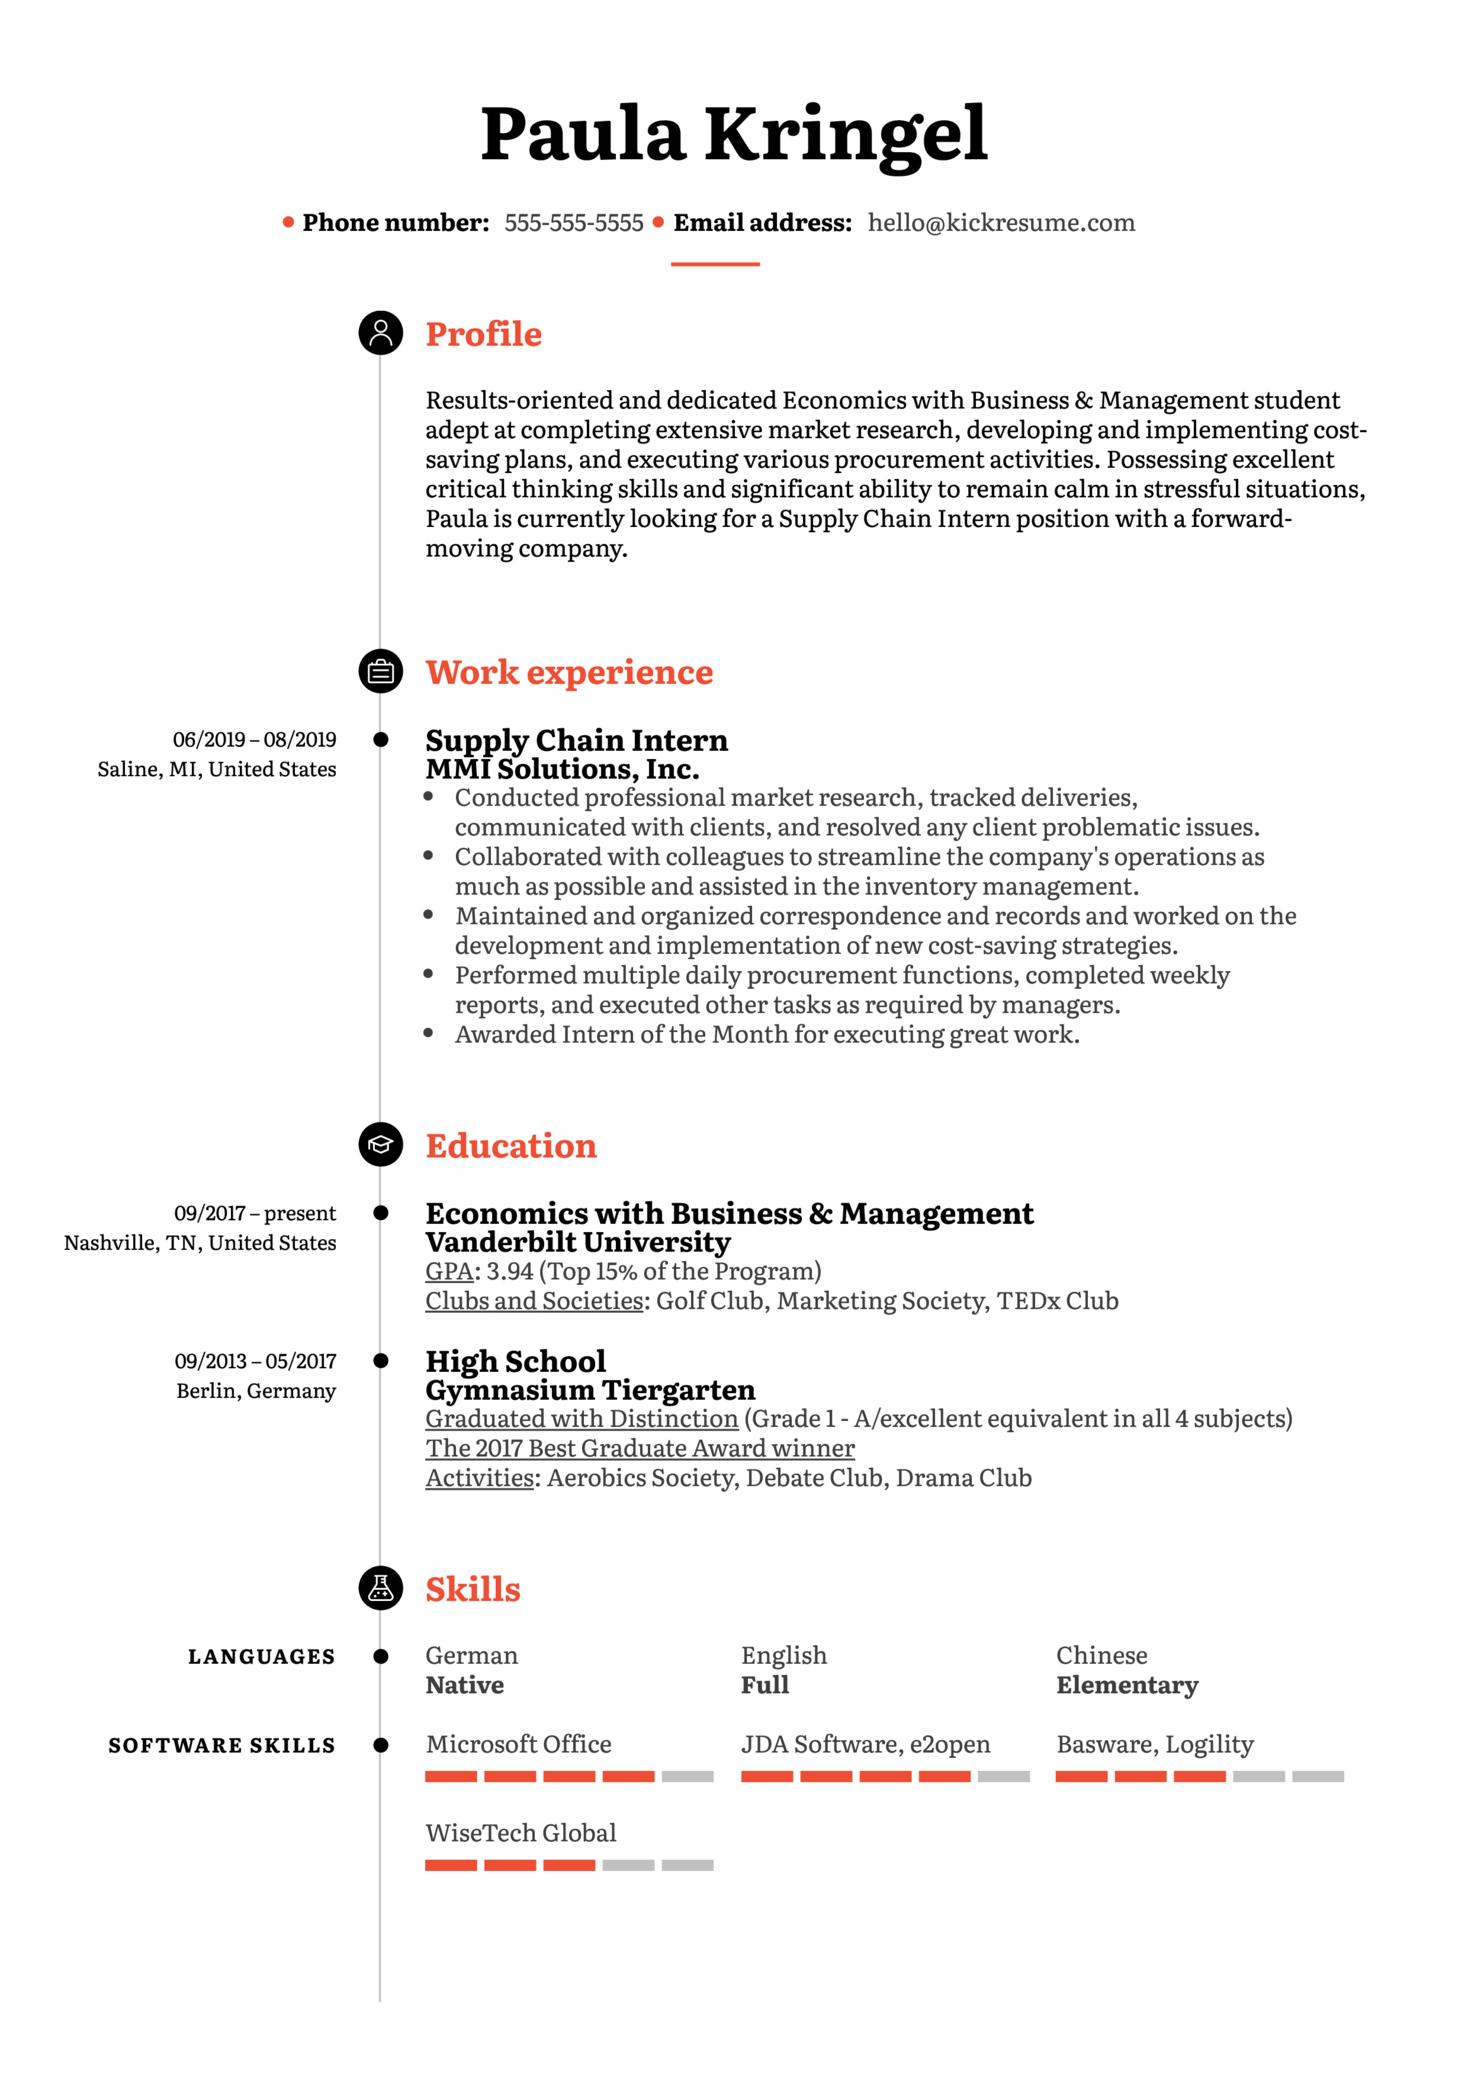 Supply Chain Intern Resume Sample (Part 1)